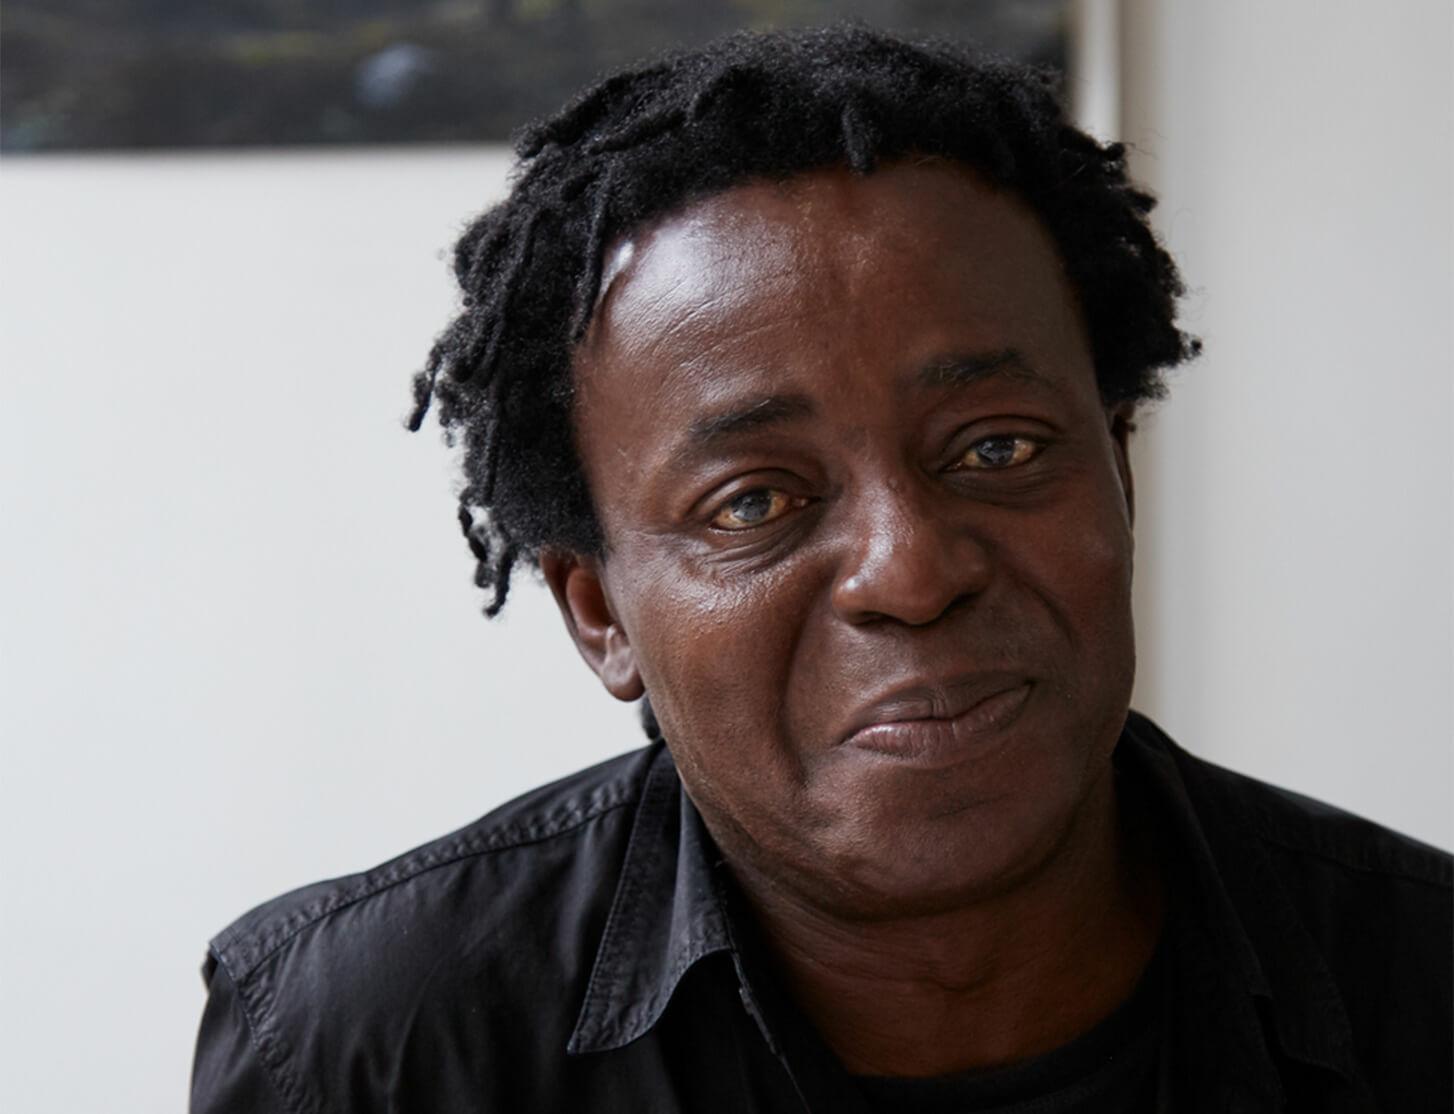 John Akomfrah wins Apollo magazine's Artist of the Year award